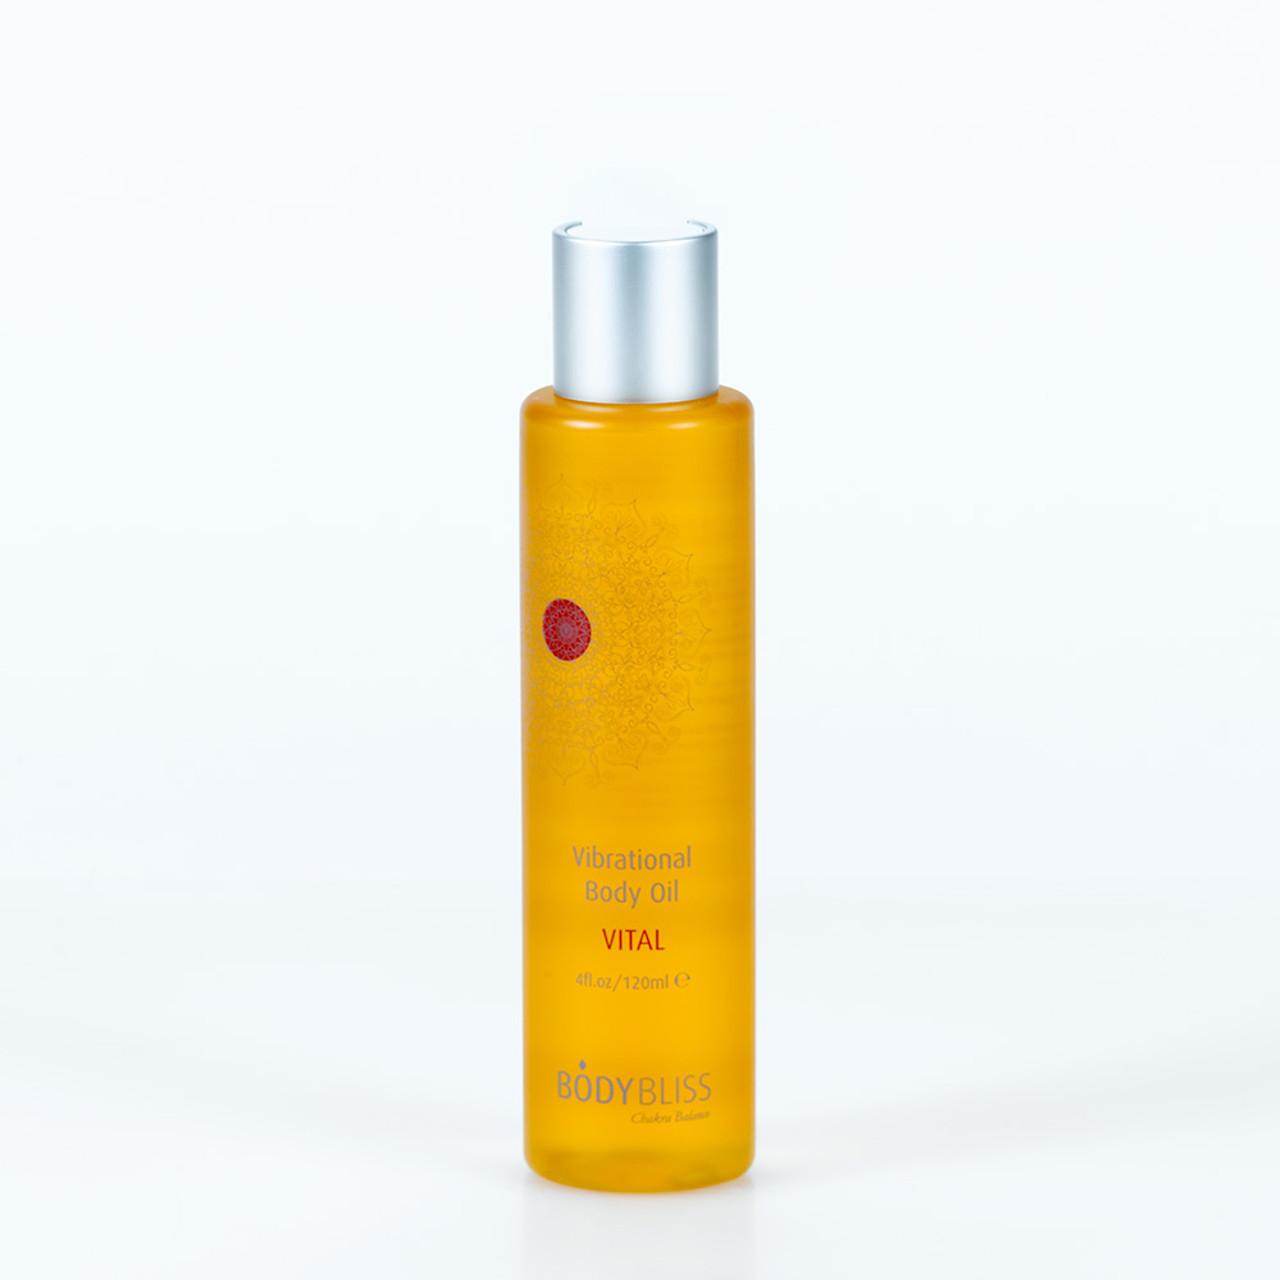 VITAL Vibrational Body Oil